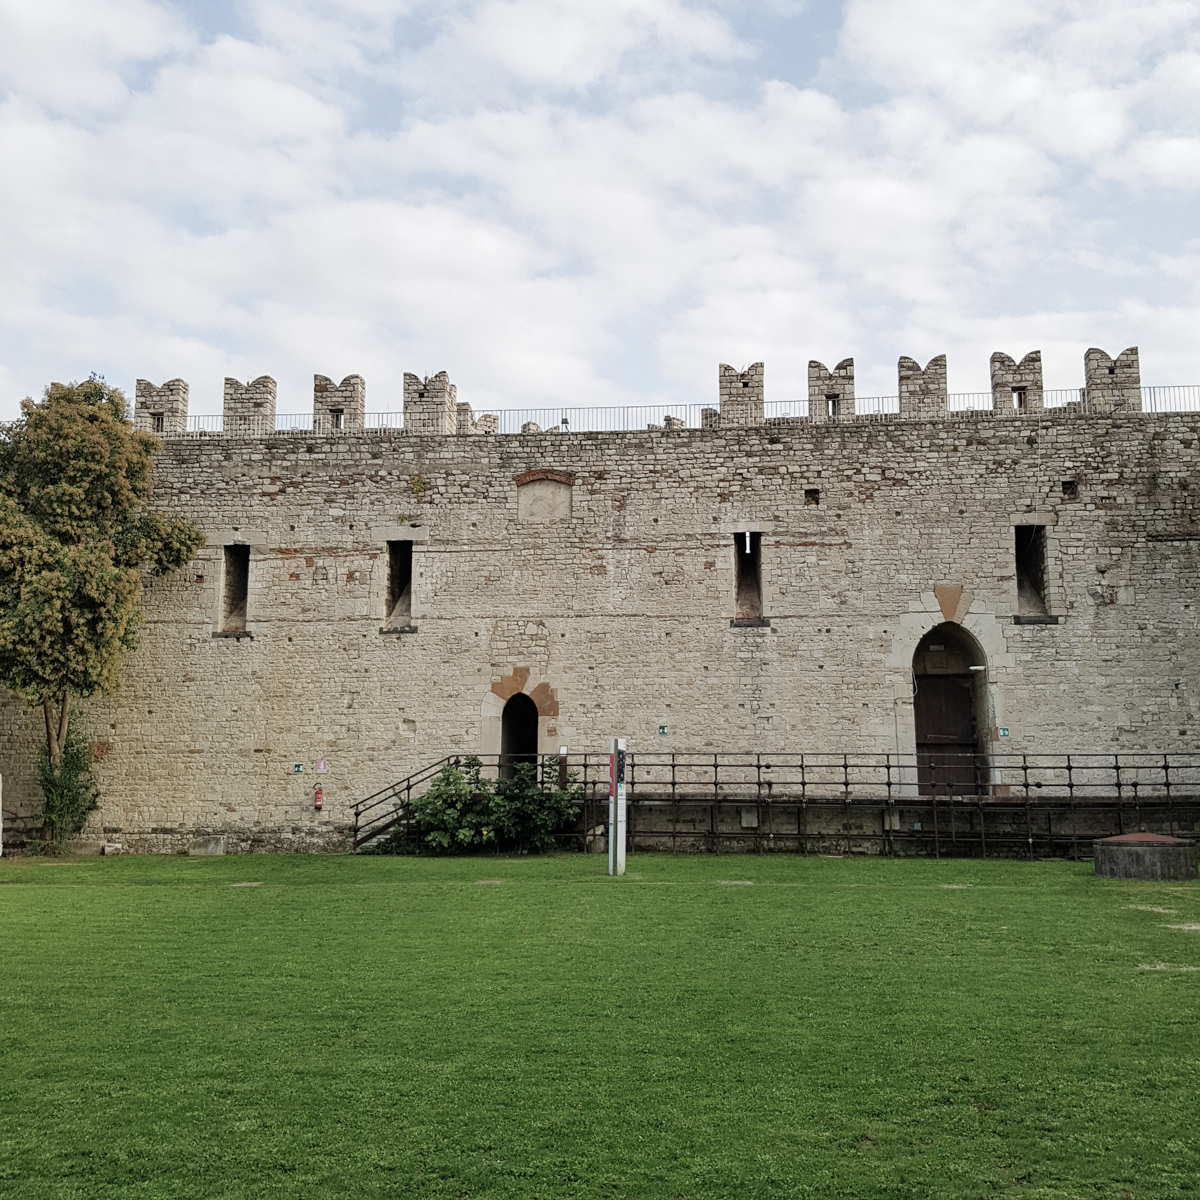 Prato-by-Style-and-Trouble-007-Castello-Imperatore